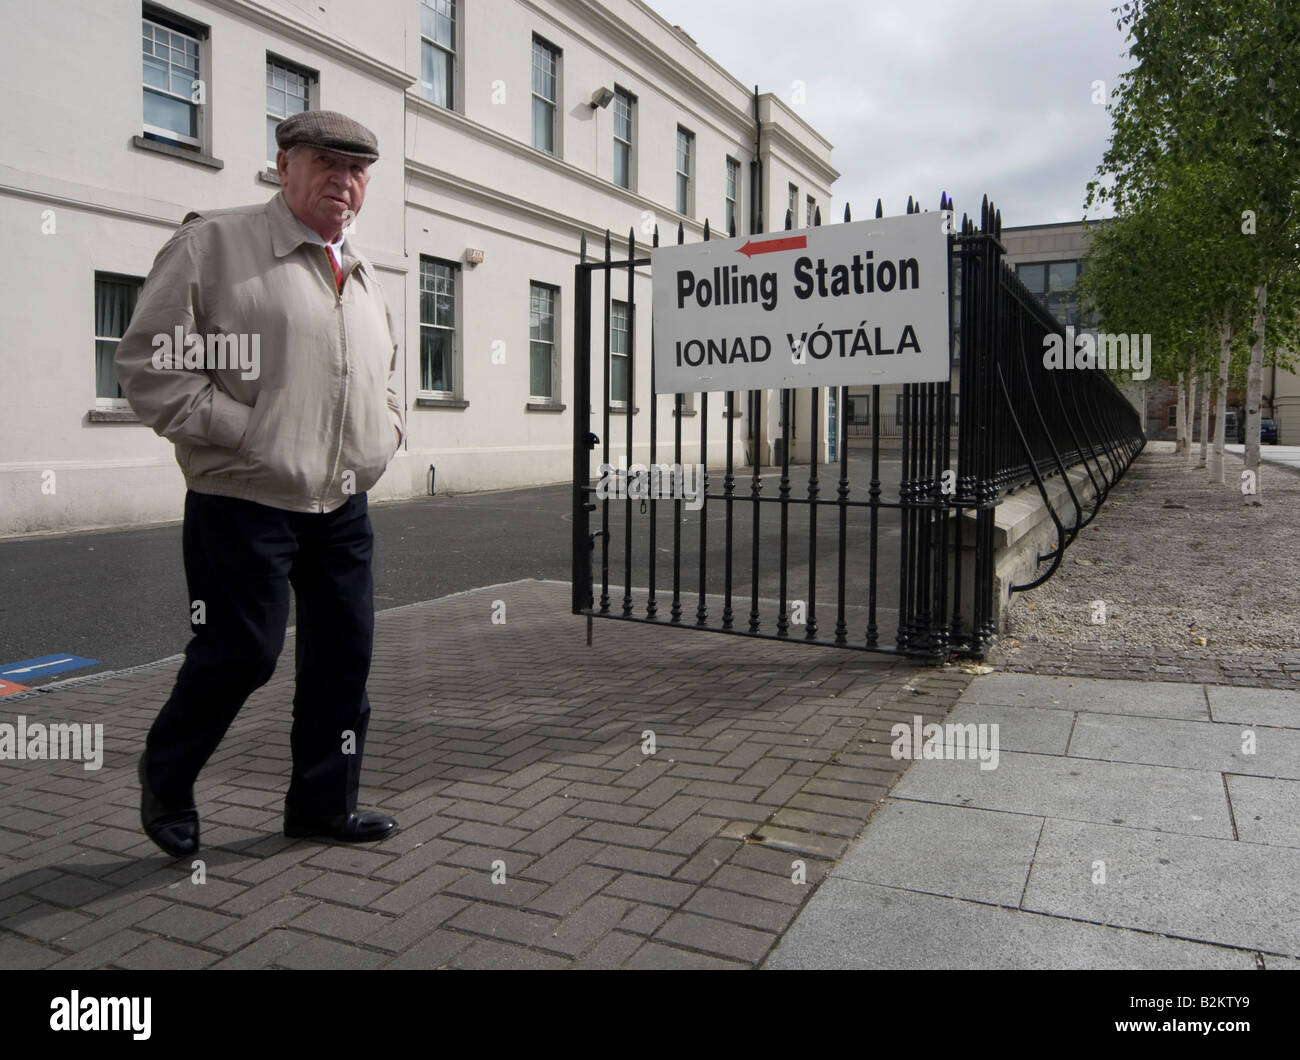 Lisbon Treaty: A disgruntled voter leaves the polling station on Dublin's Marlborough St - Stock Image